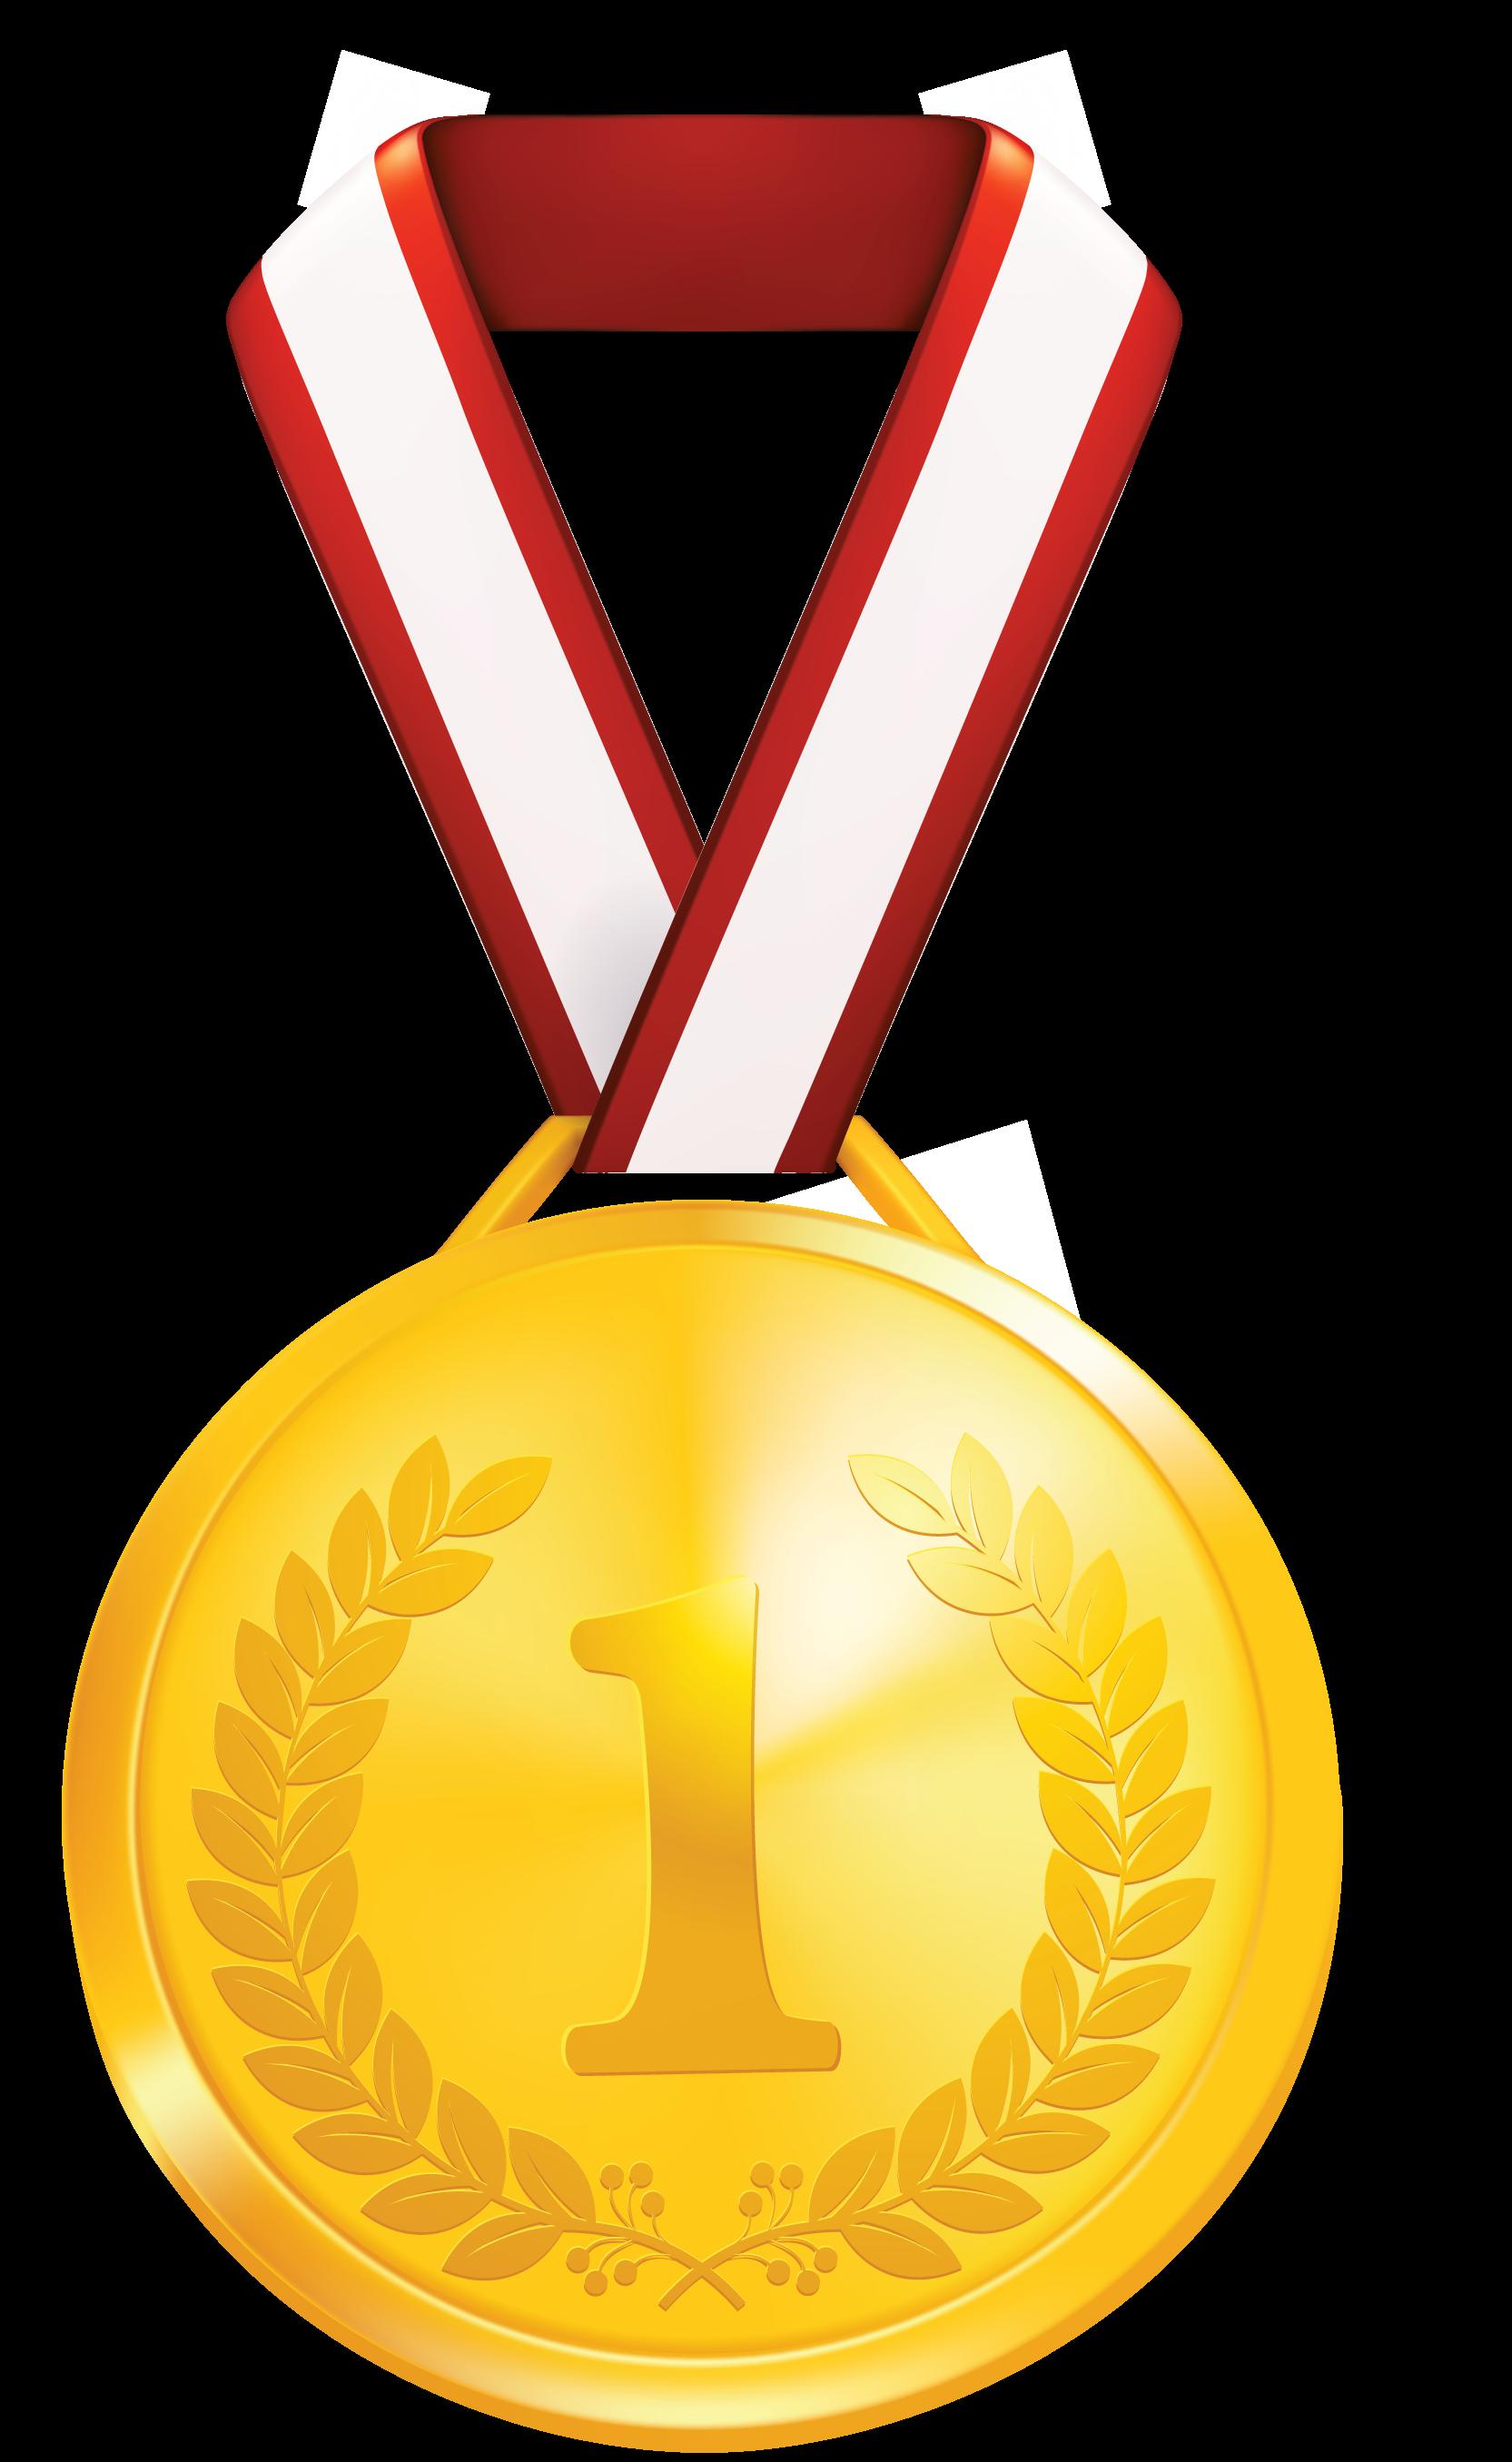 Gold medallion clipart